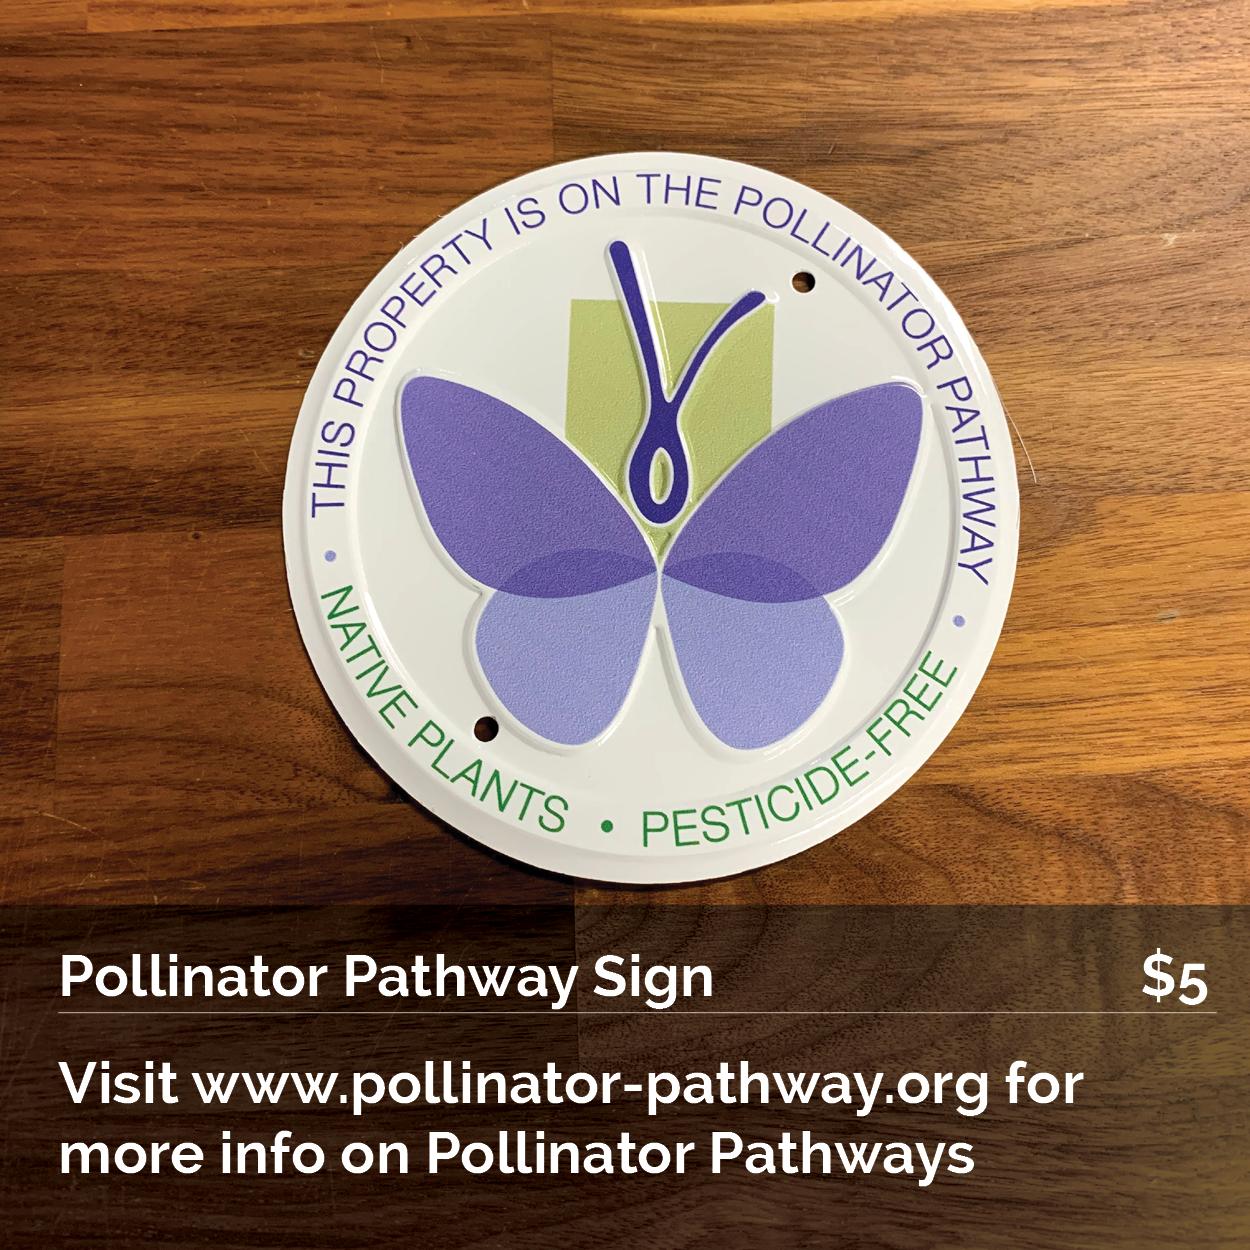 Pollinator Pathway Sign